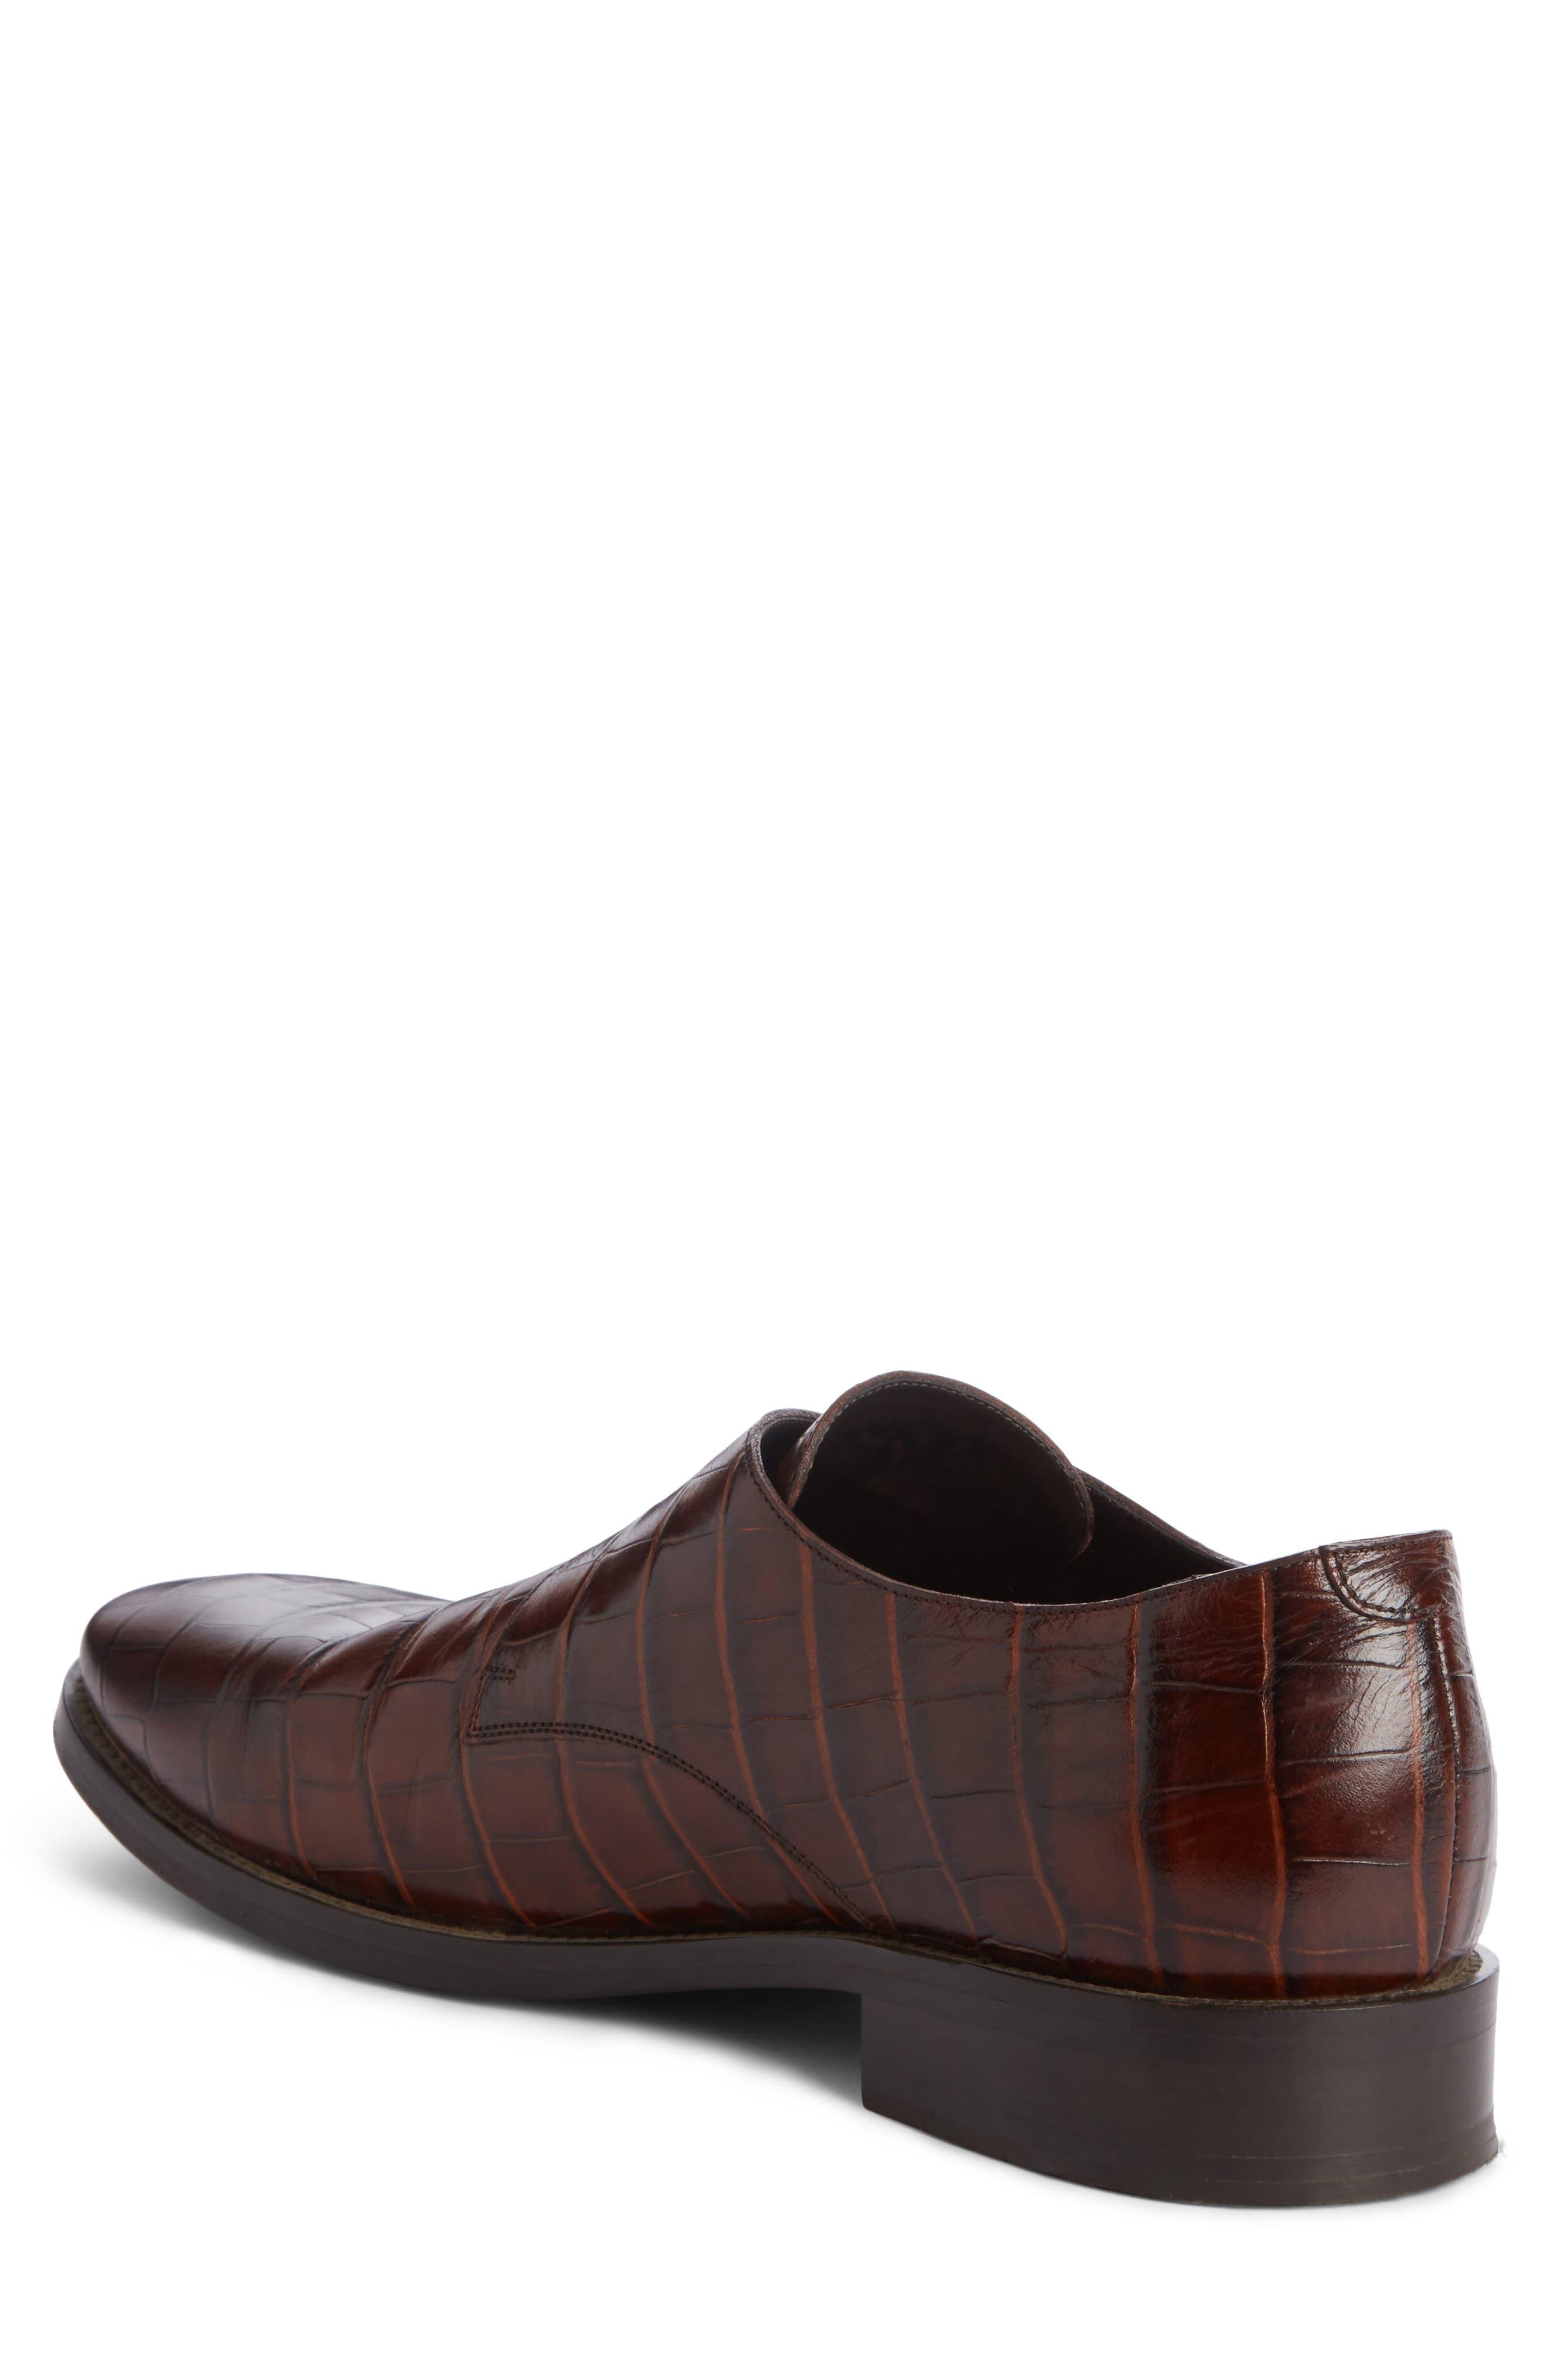 Monk Strap Shoe,                             Alternate thumbnail 2, color,                             Marron Chocolat